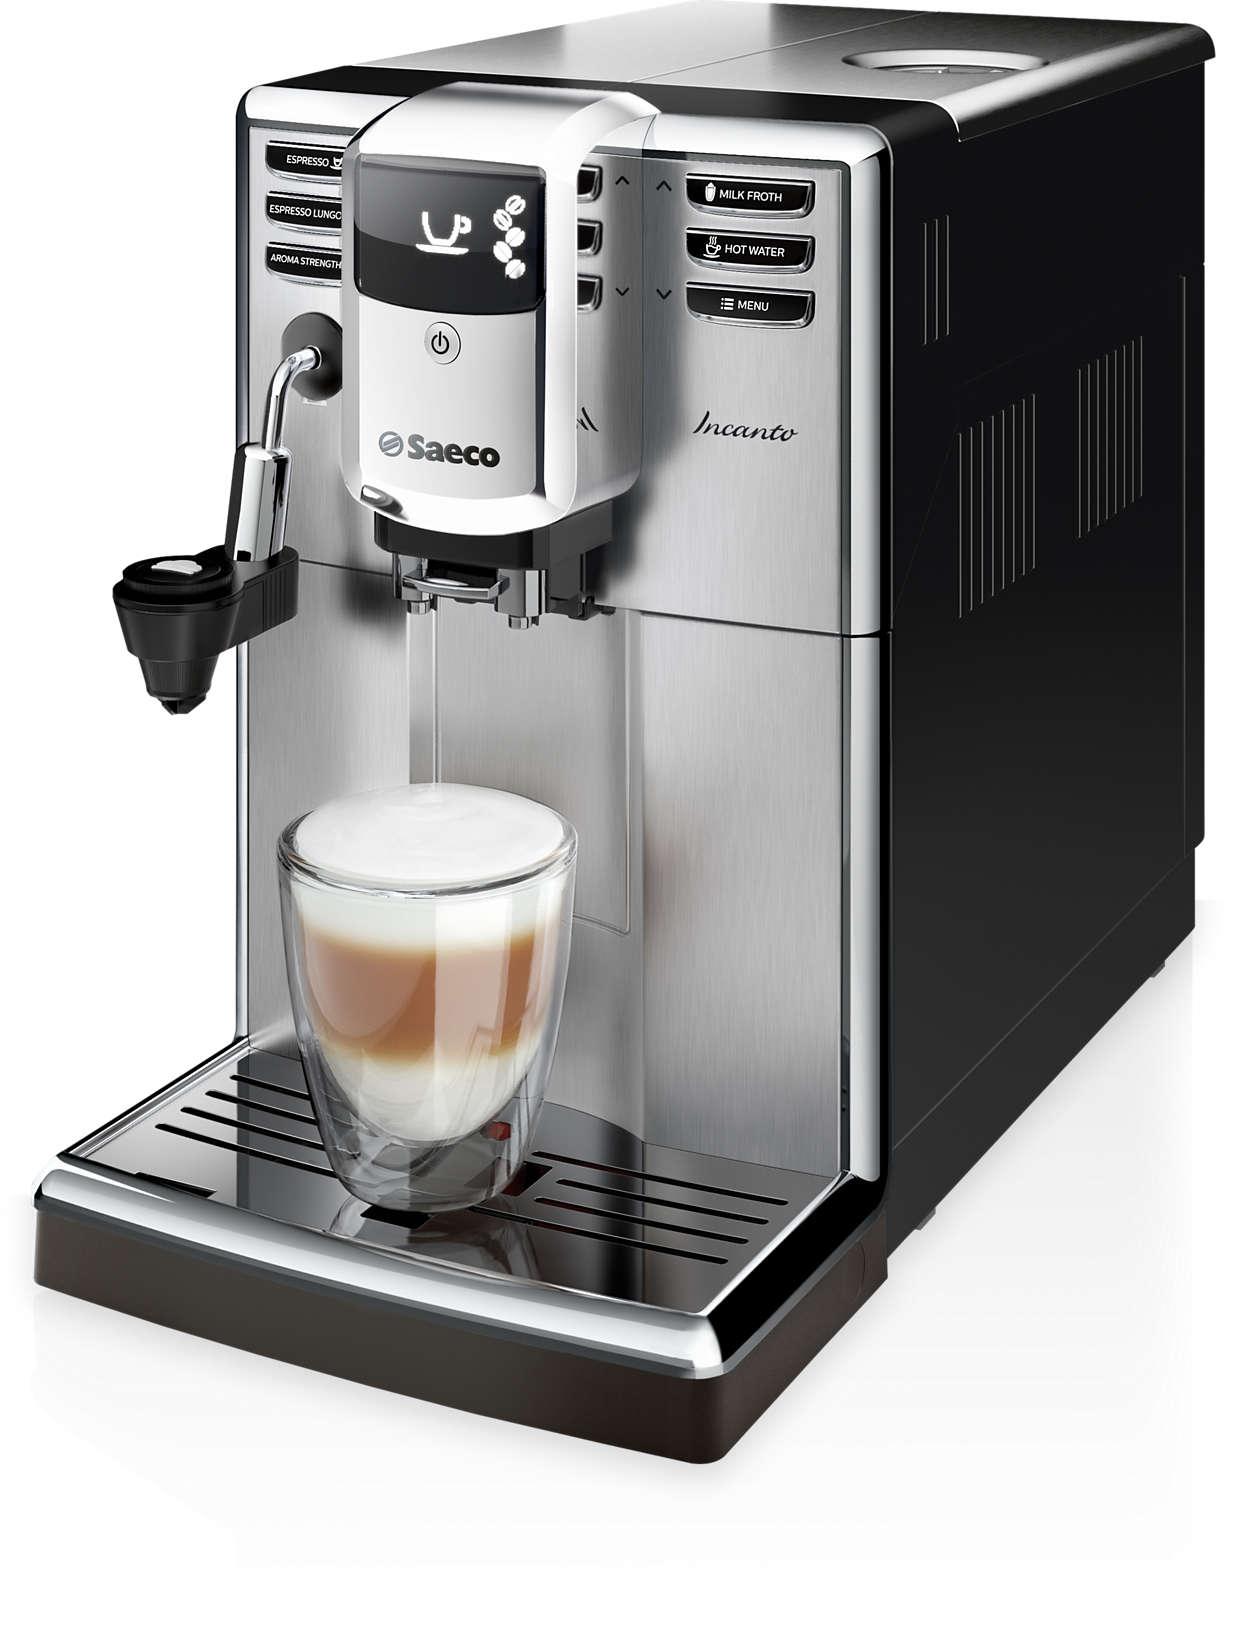 incanto machine espresso super automatique hd8914 01 saeco. Black Bedroom Furniture Sets. Home Design Ideas